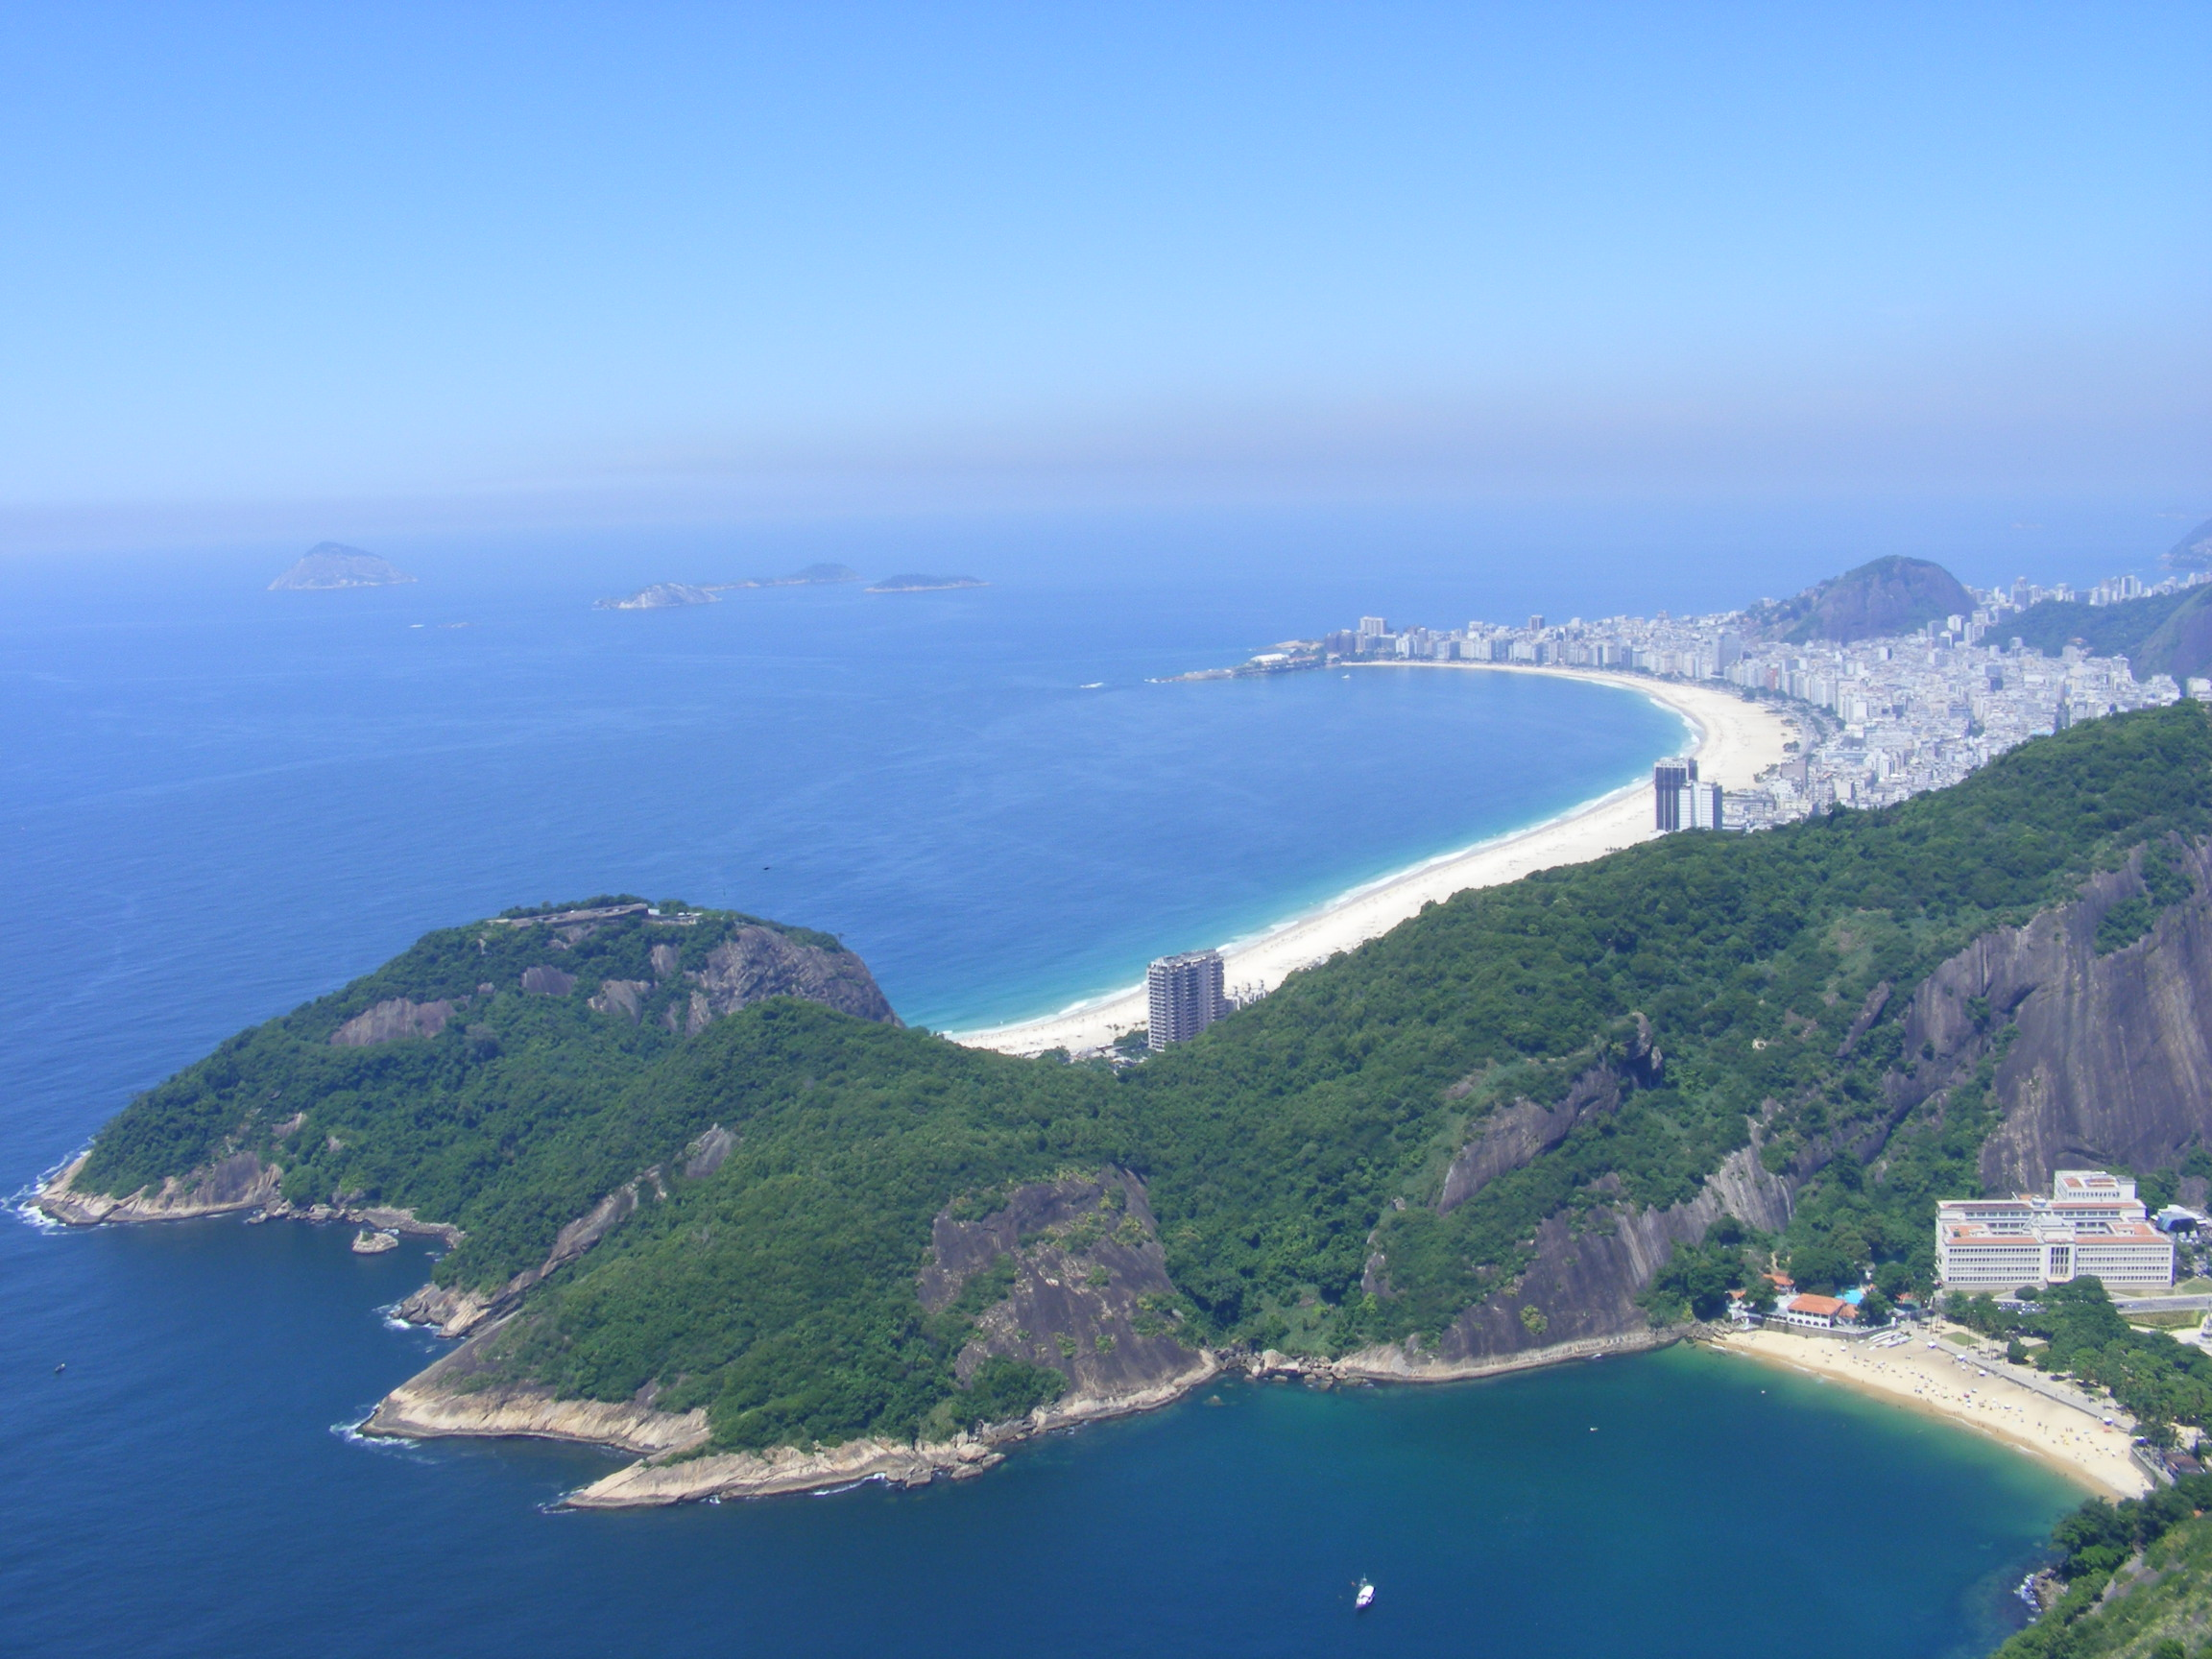 Vista da área da Praia de Copacabana